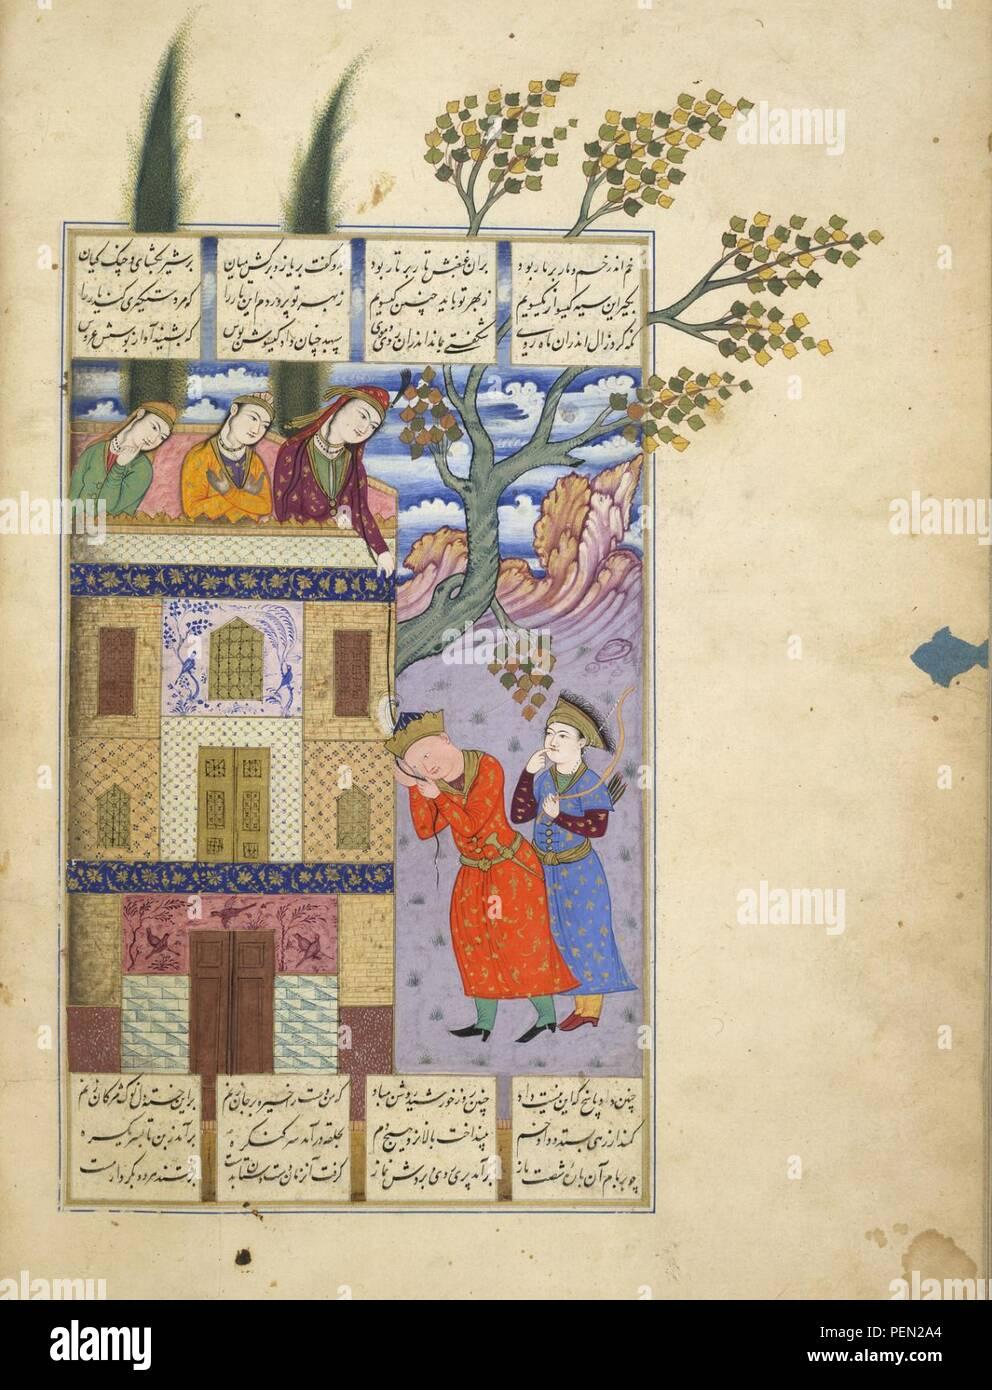 Shahnama. - caption  'Rudaba and Zal' - Stock Image